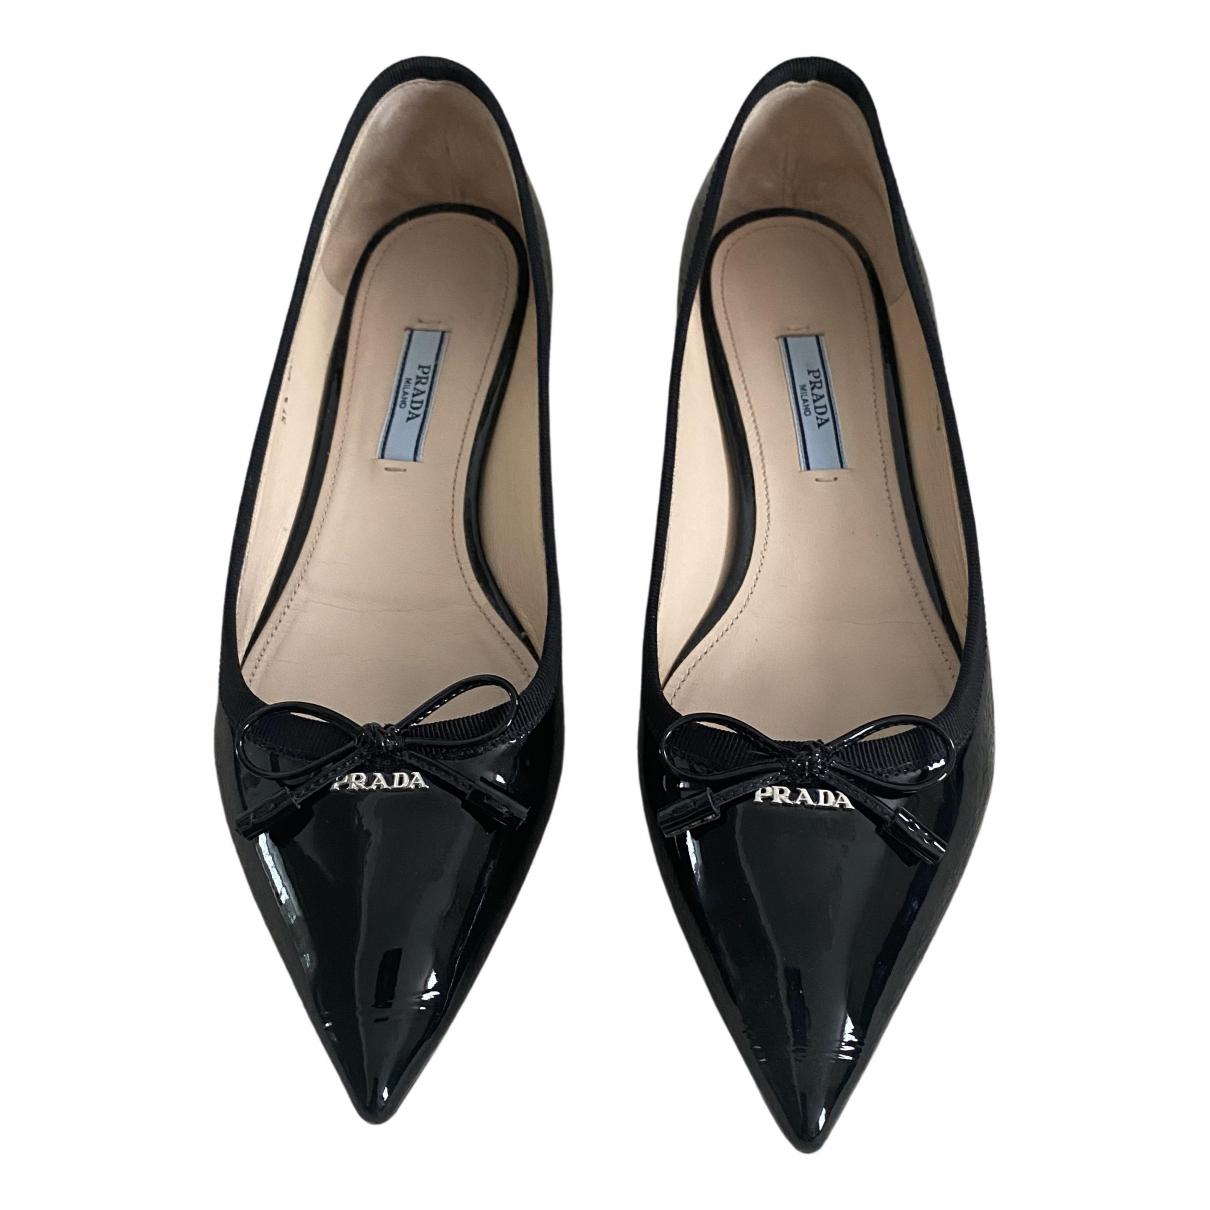 Prada \N Black Patent leather Ballet flats for Women 37.5 EU